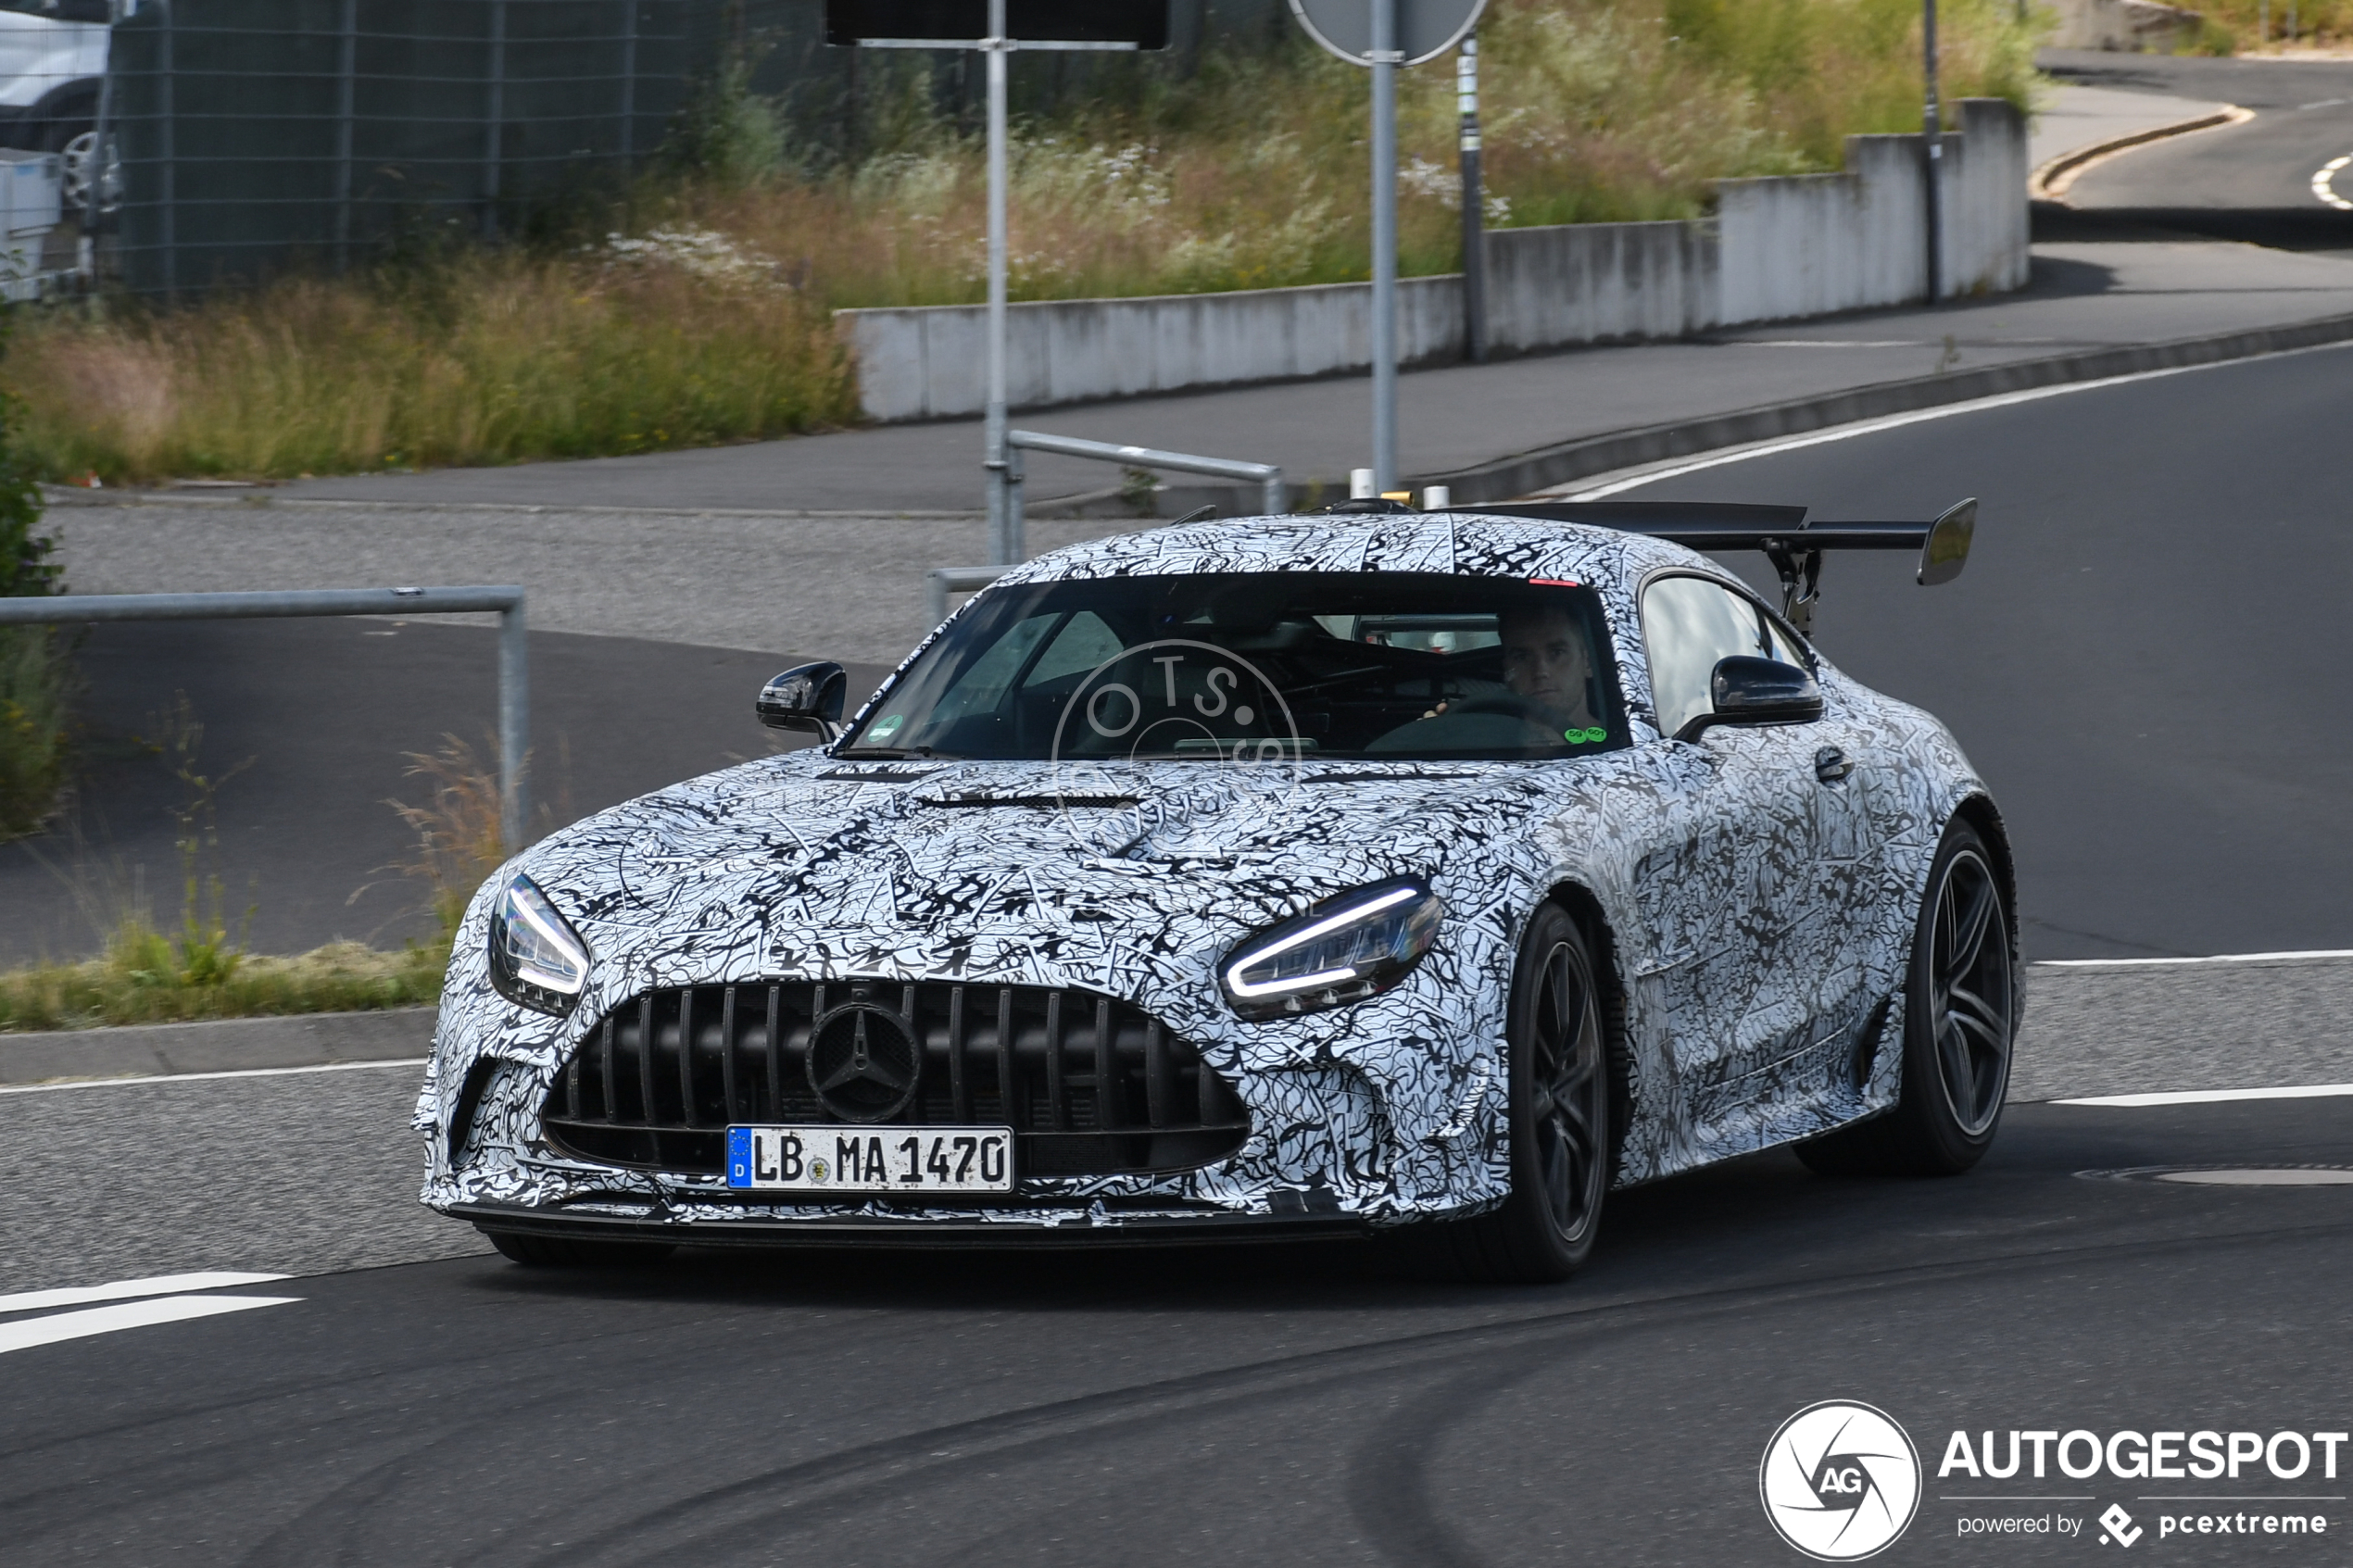 2014 Mercedes-AMG GT 8